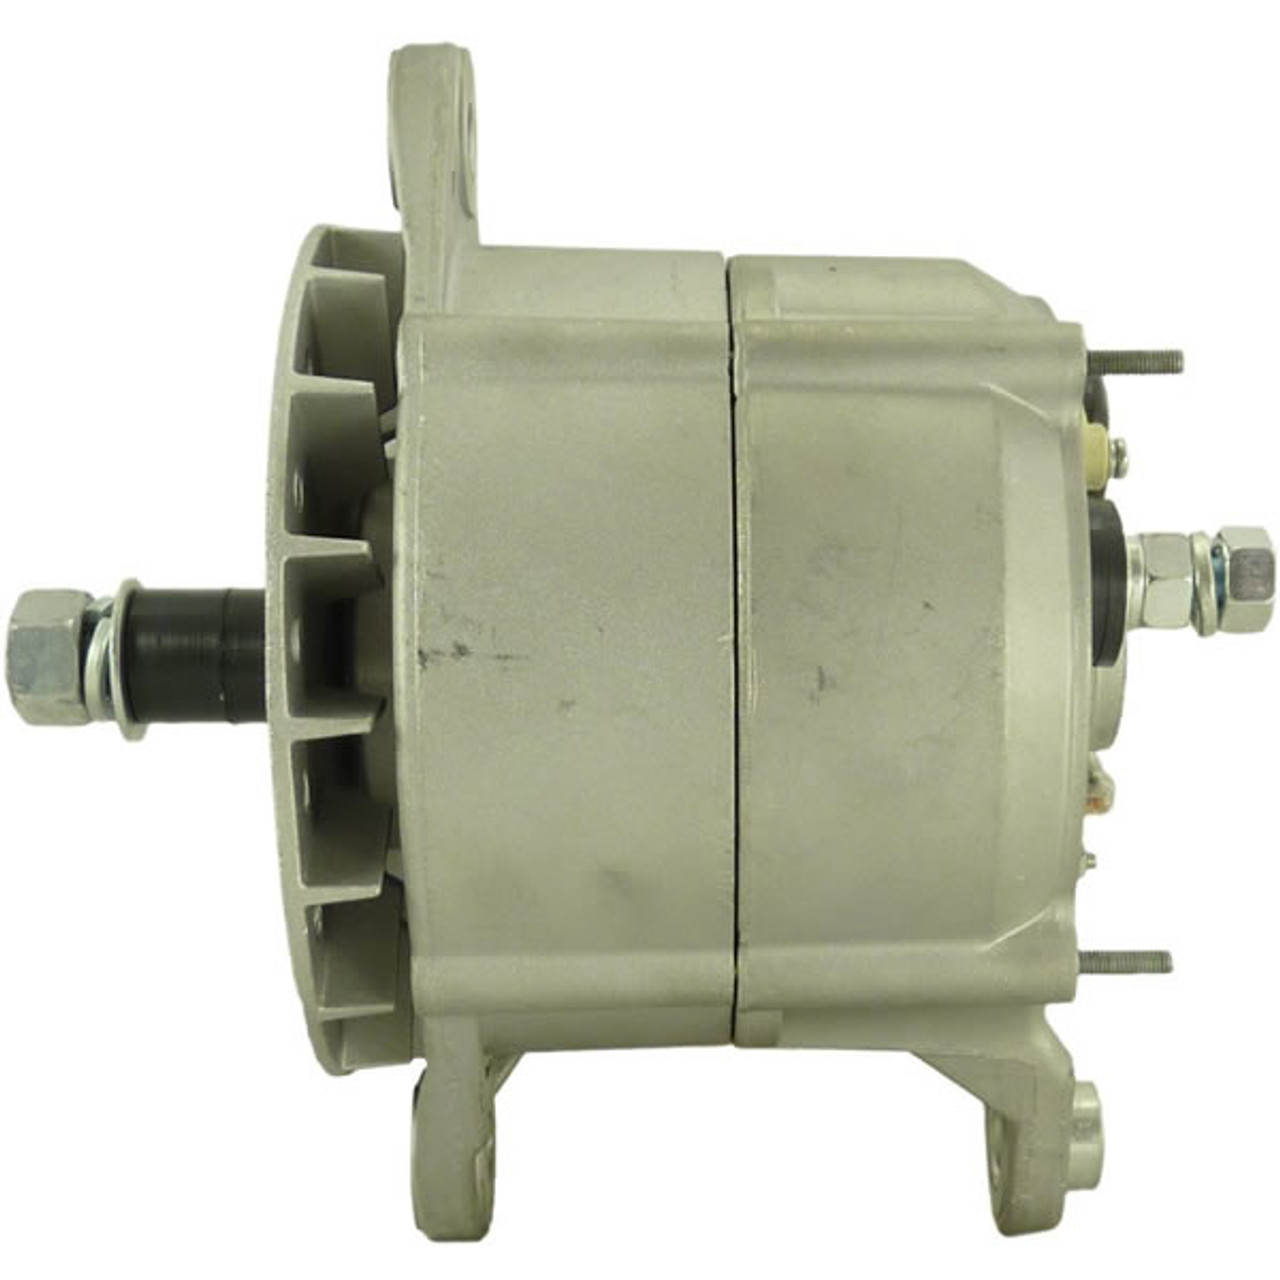 Alternator CASE STX375 STX375QT STX425 STX425QT STX440 STX440QT STX450 STX450QT